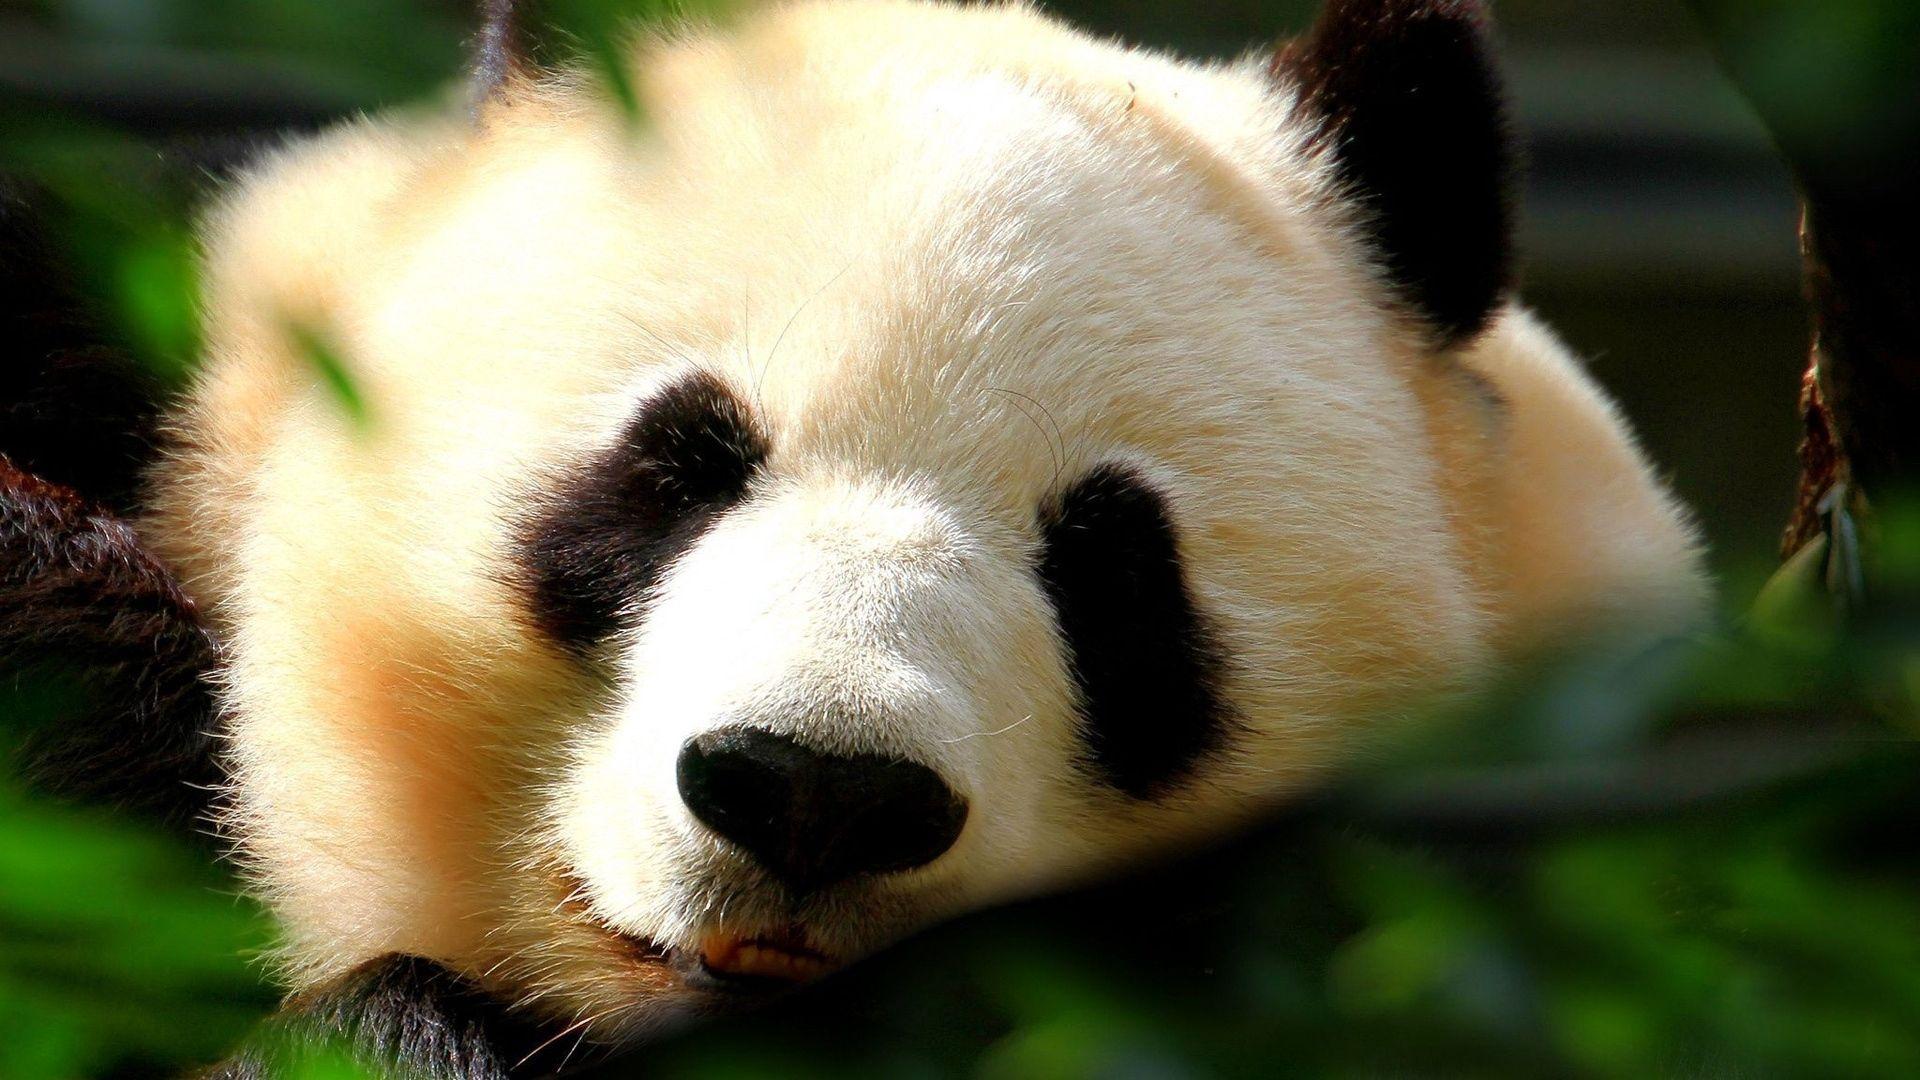 Wallpaper Desktop 1920x1080 Panda